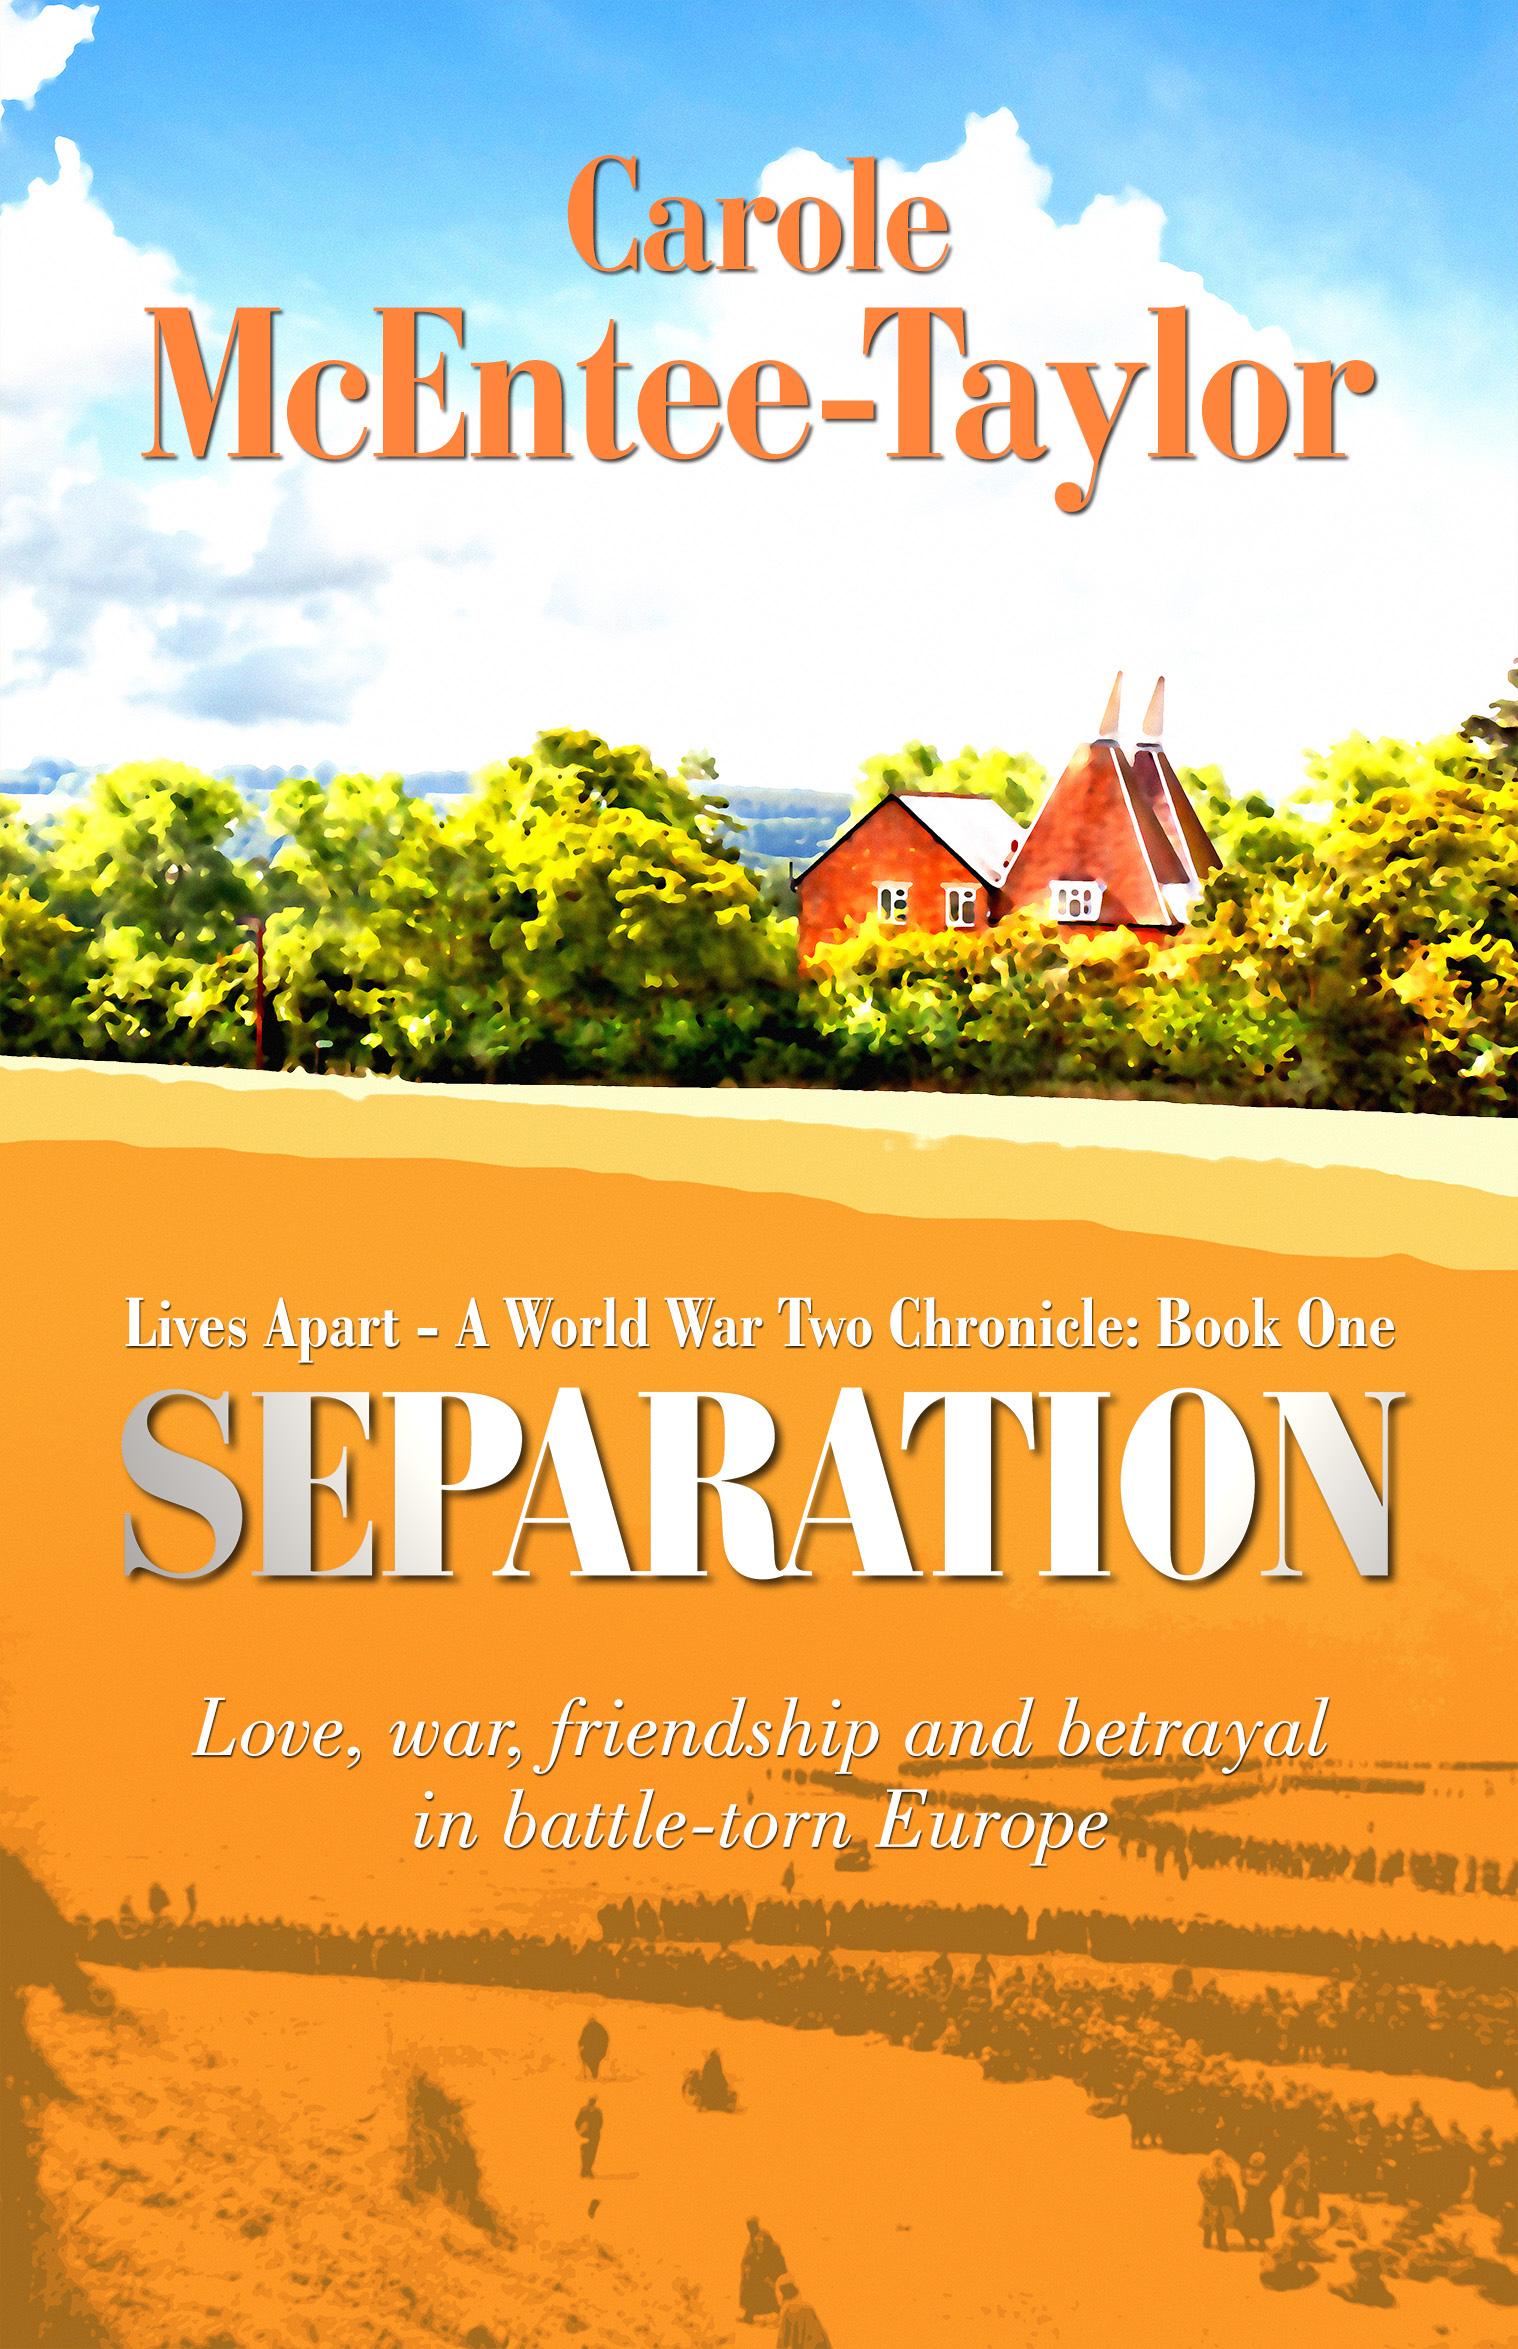 Lives Apart: Separation